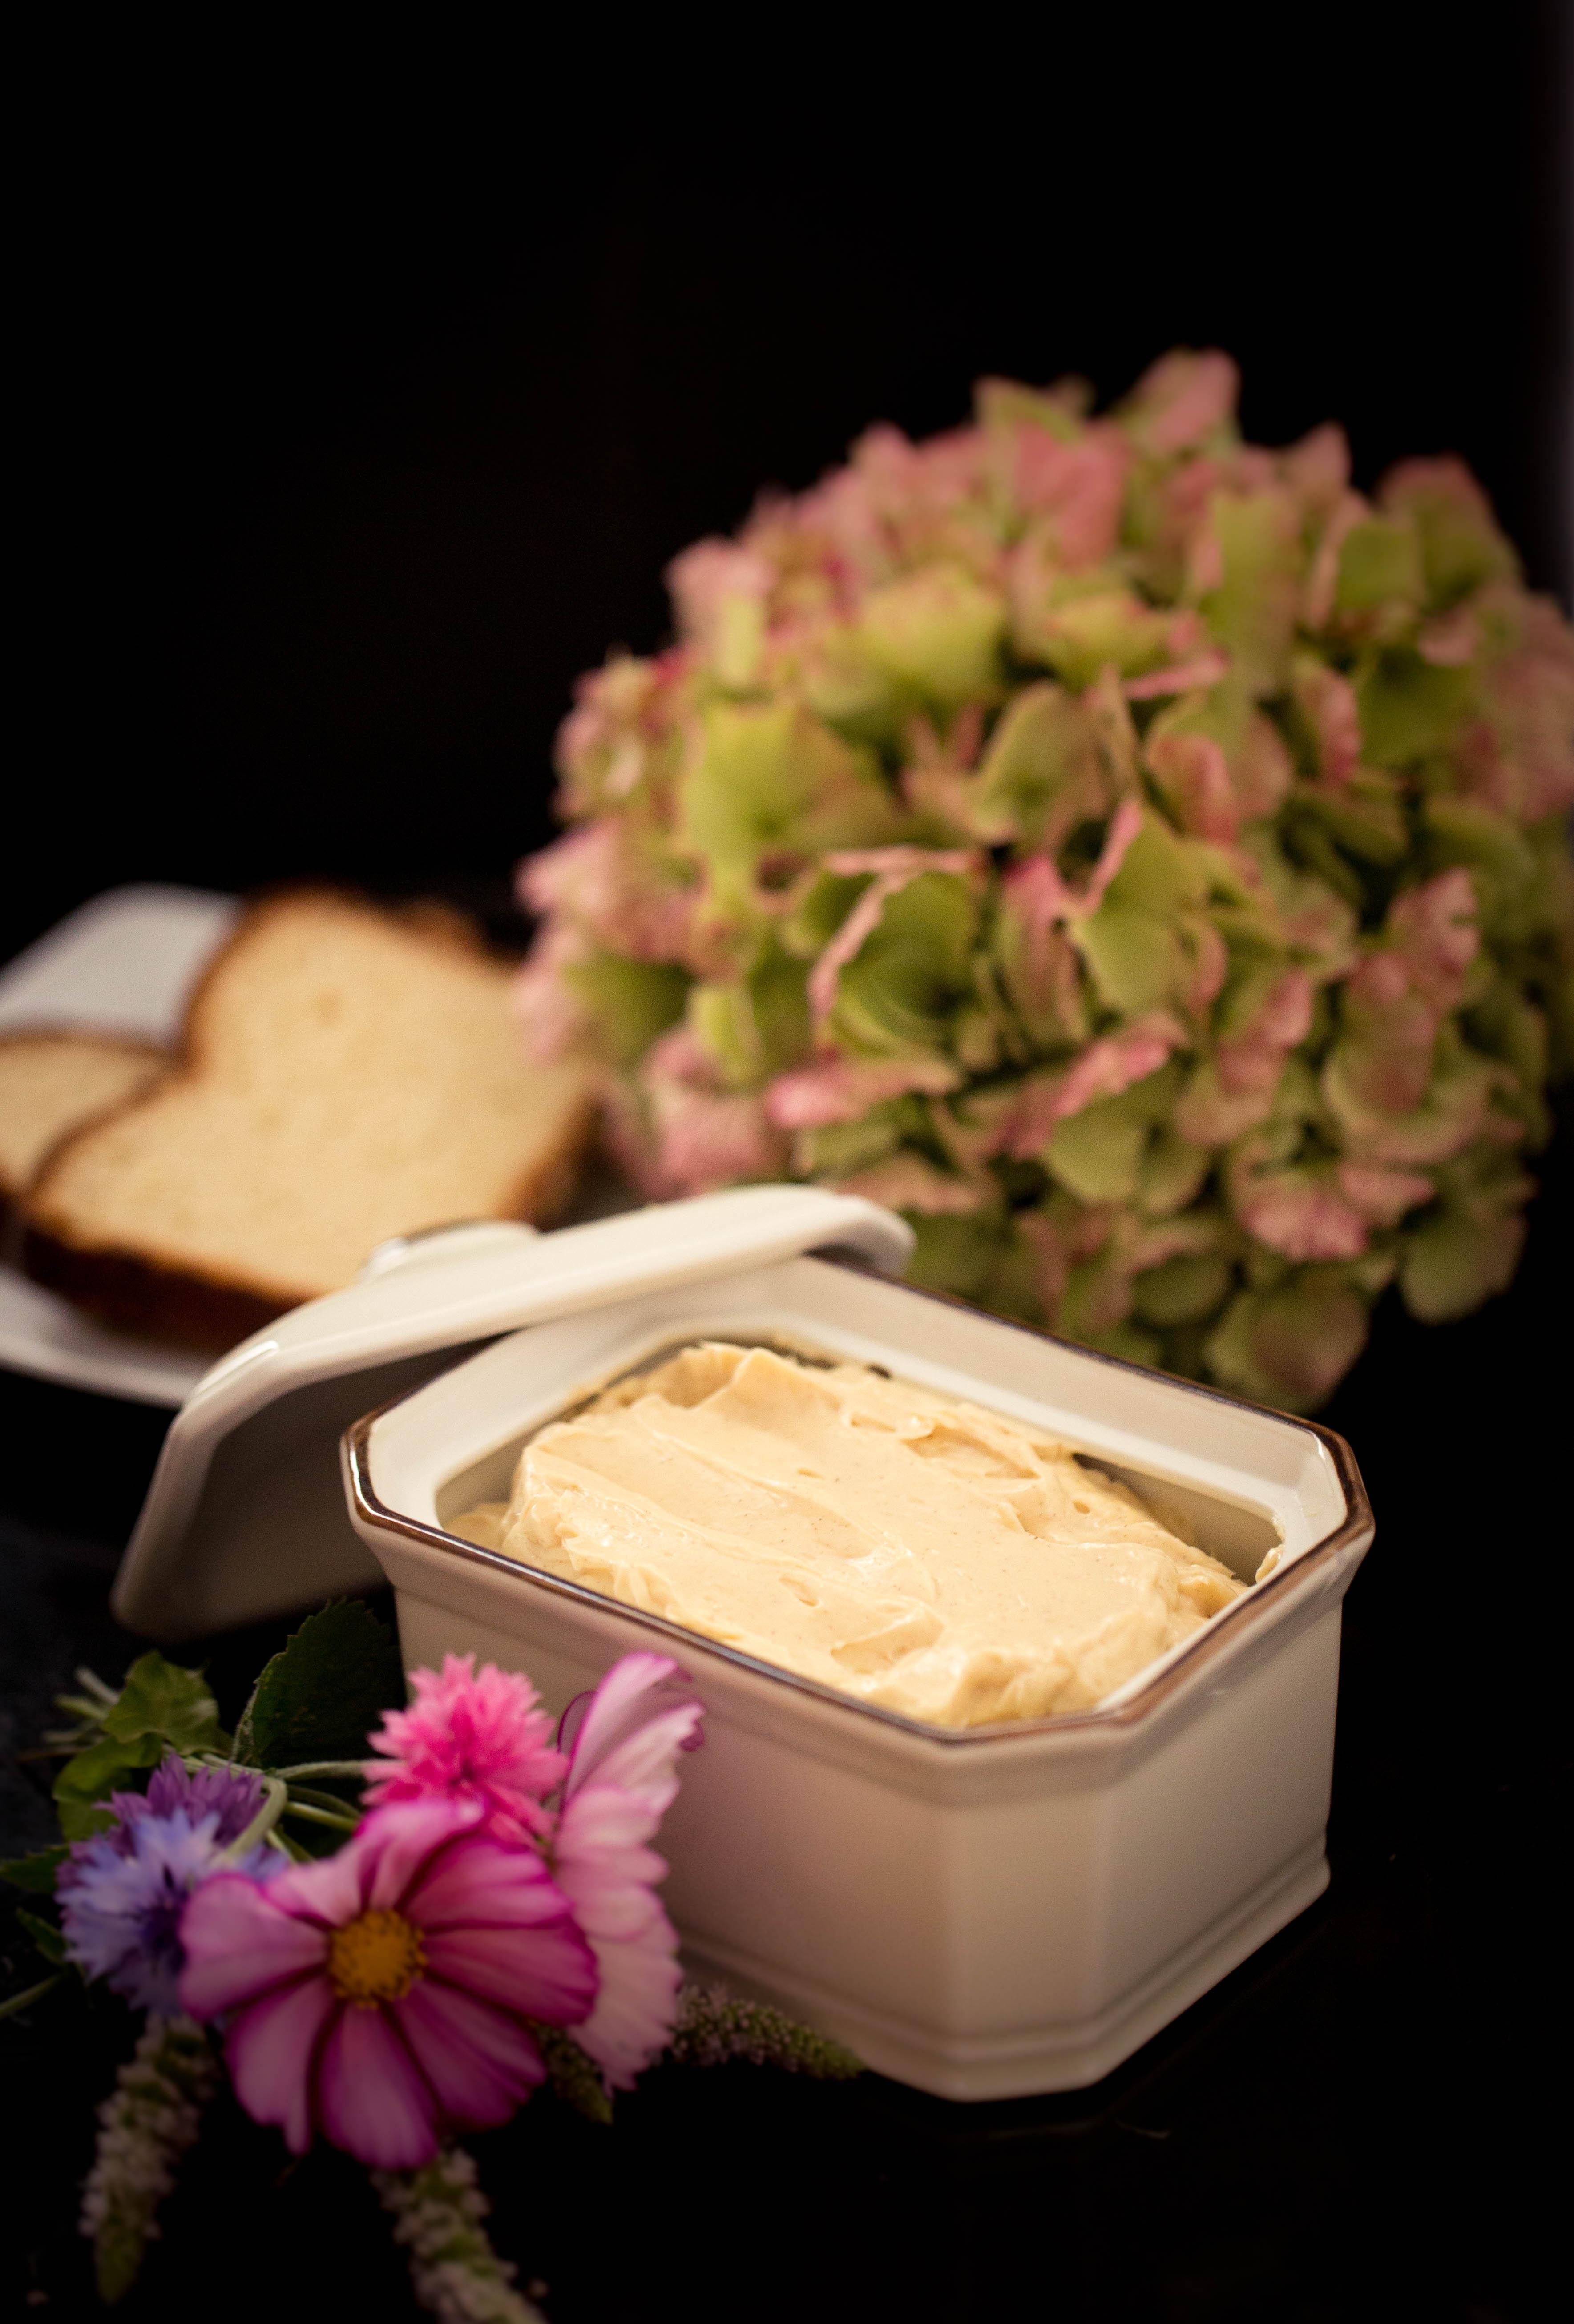 Honig-Zimt-Butter aus dem Thermomix®